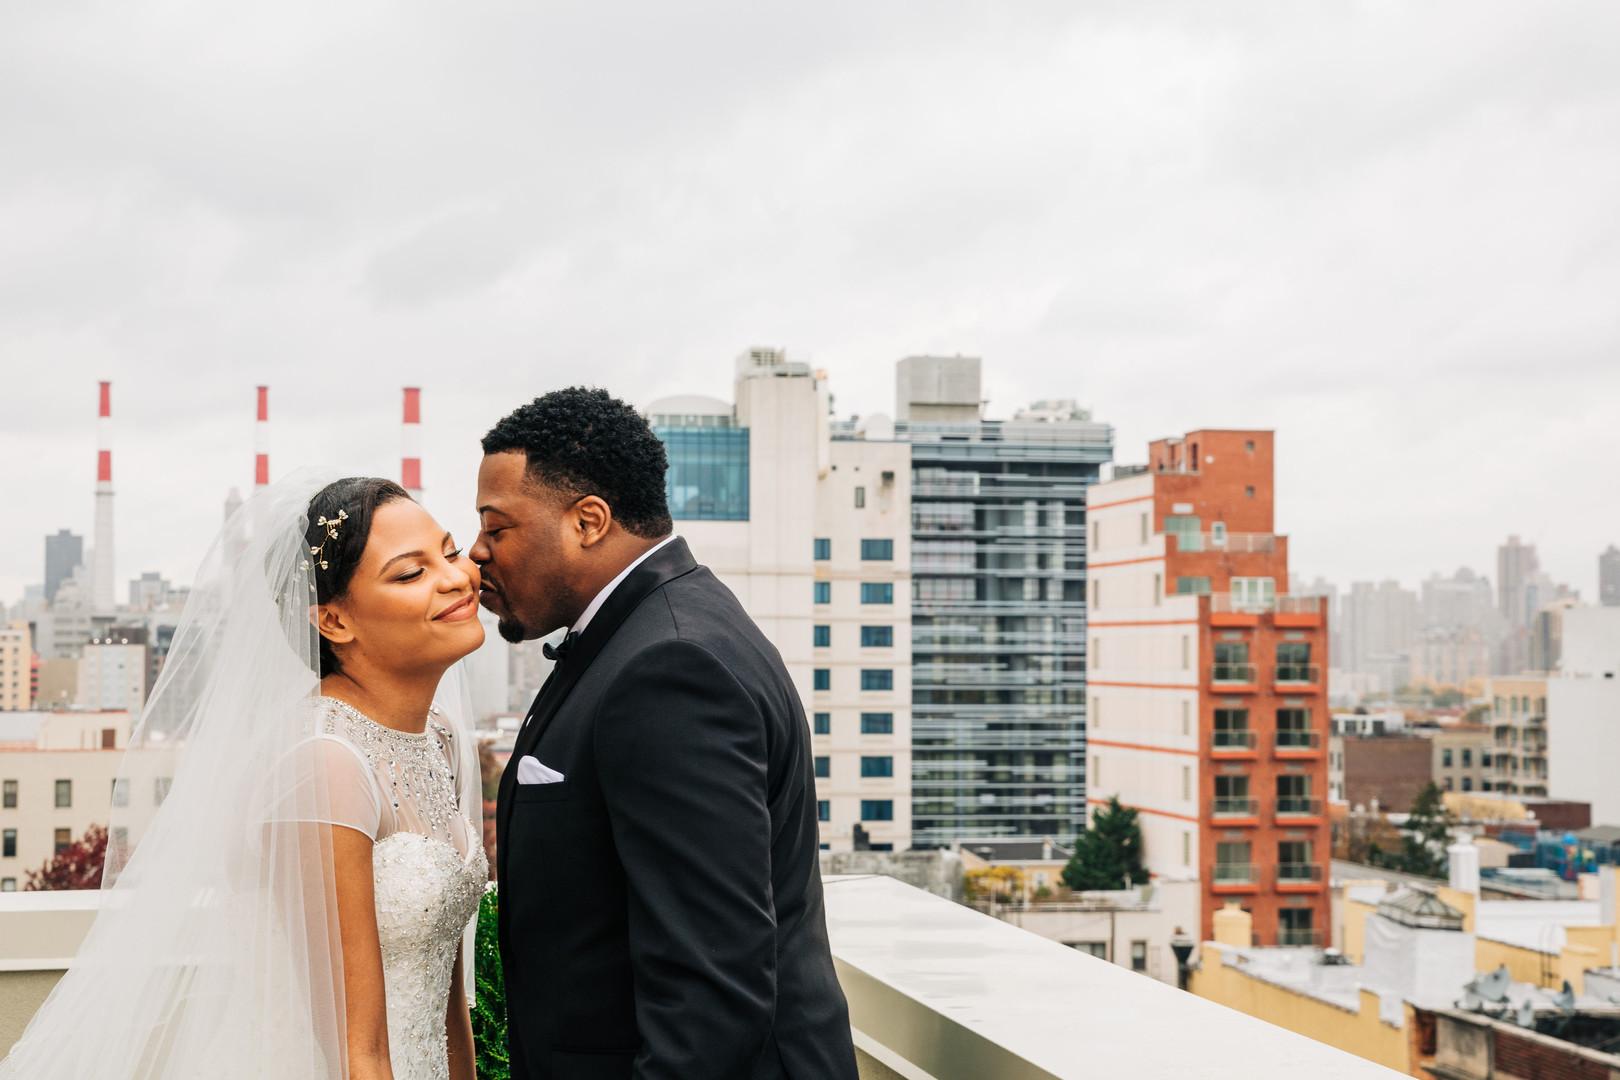 black couple sweet wedding day kiss